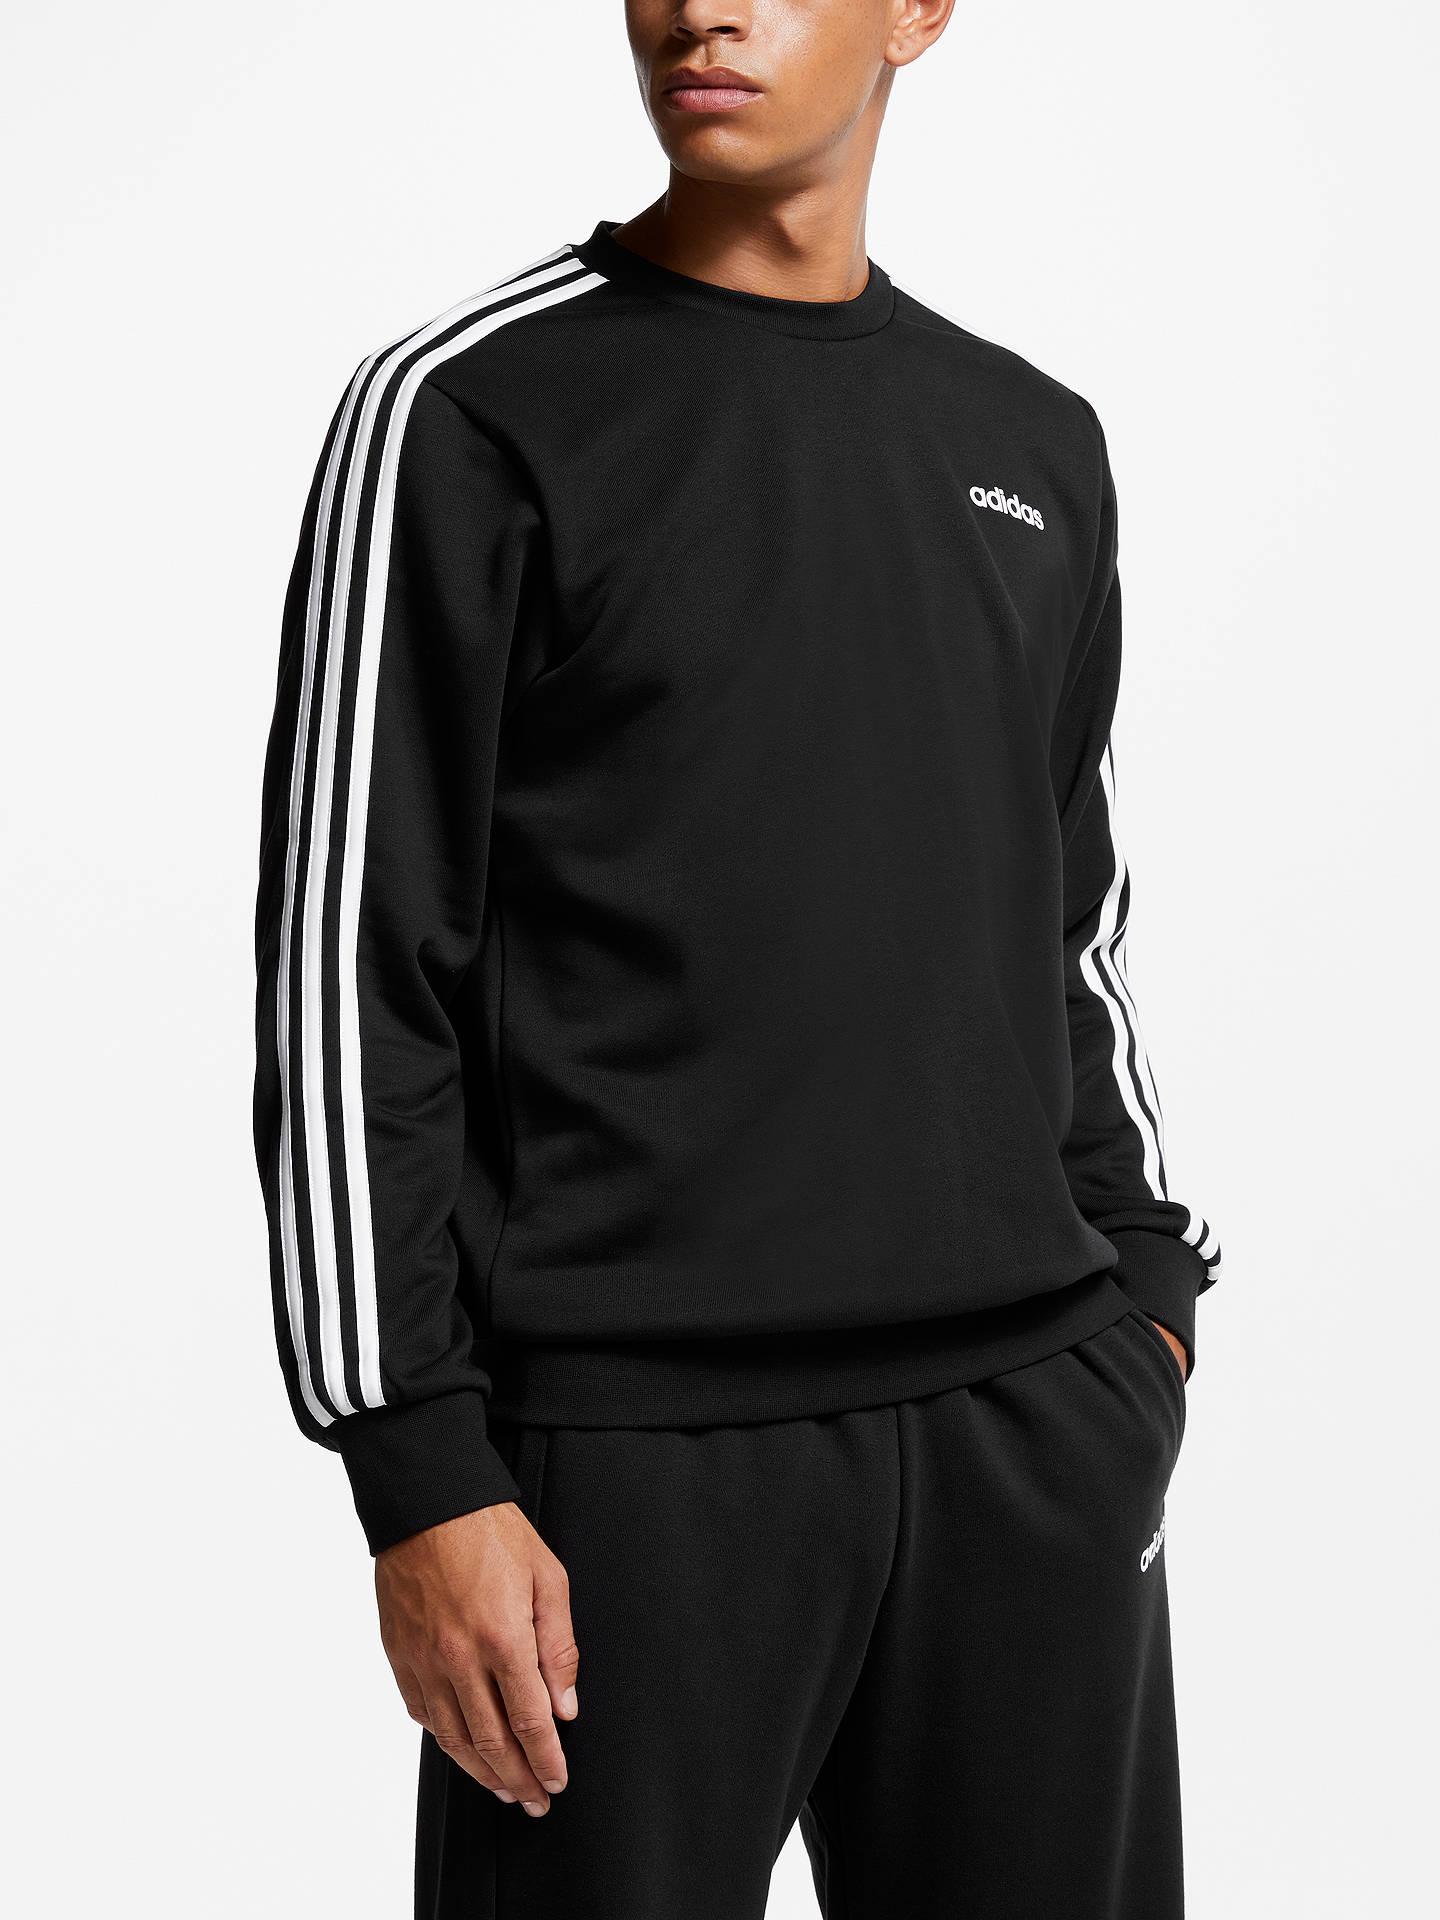 ceb982e685e Buy adidas Essentials 3-Stripes Sweatshirt, Black/White, S Online at  johnlewis ...